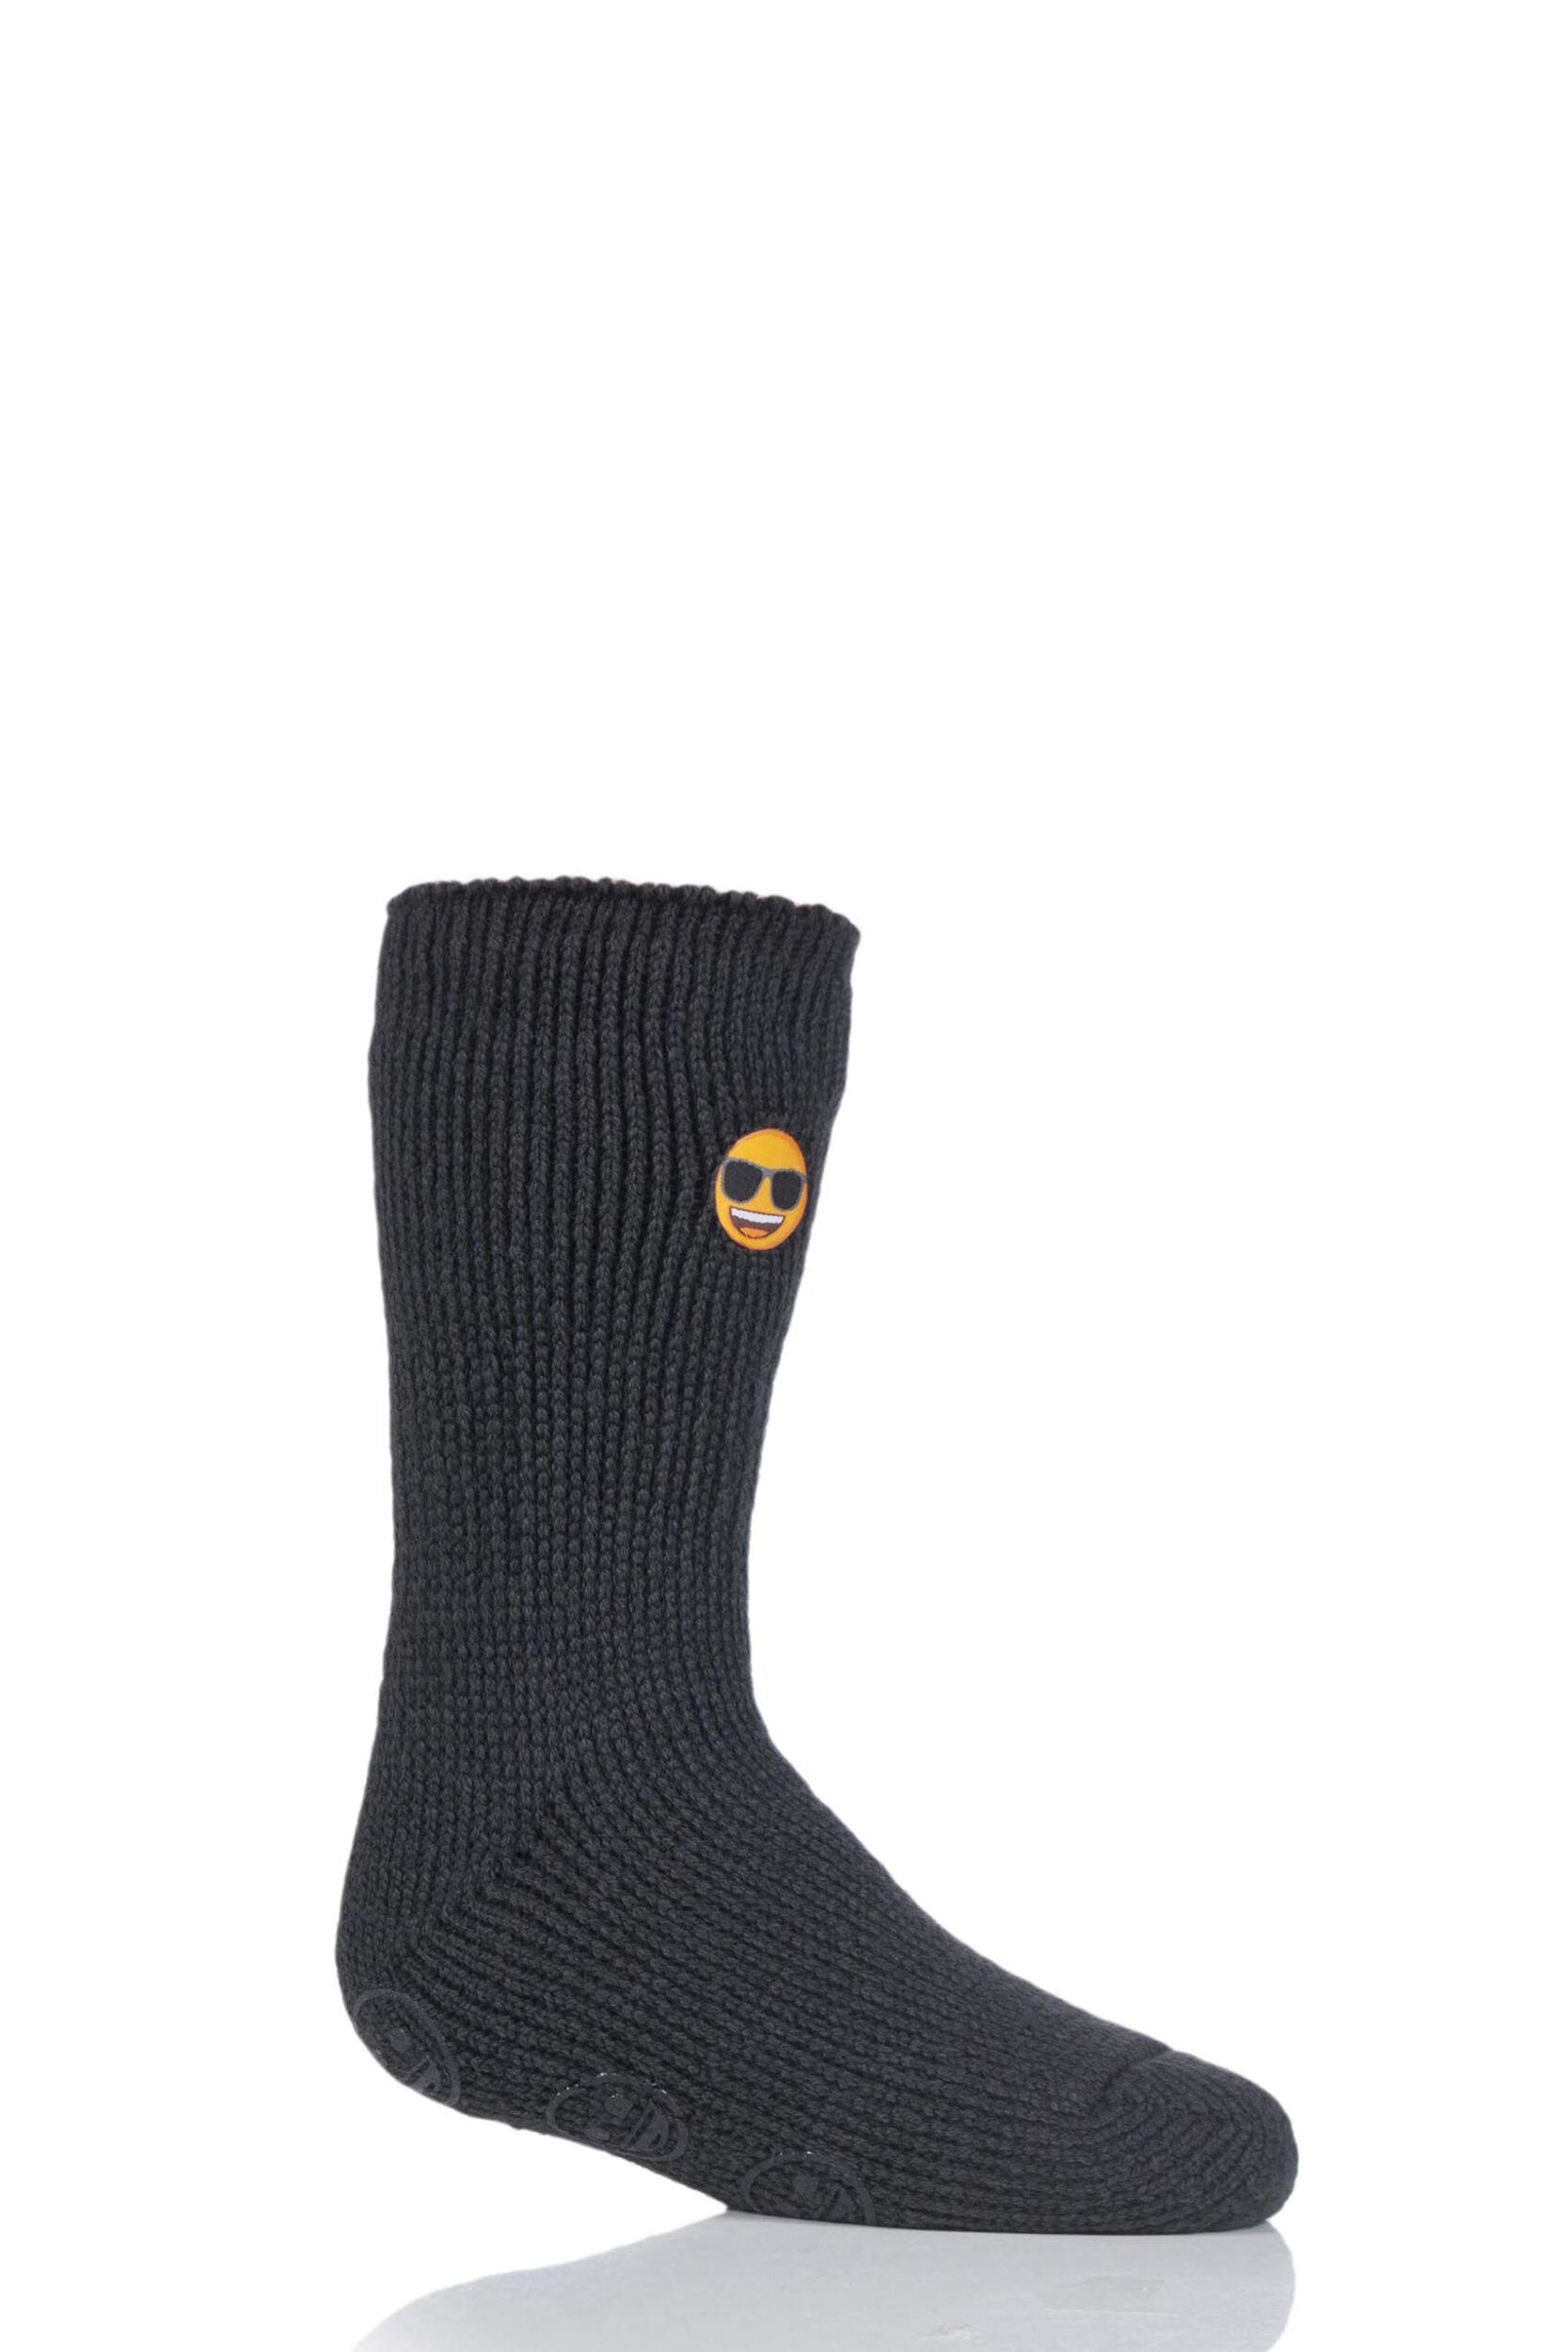 Image of 1 Pair Charcoal Emoji Sunglasses Face Slipper Socks Kids Unisex 12.5-3.5 Kids (8-12 Years) - Heat Holders